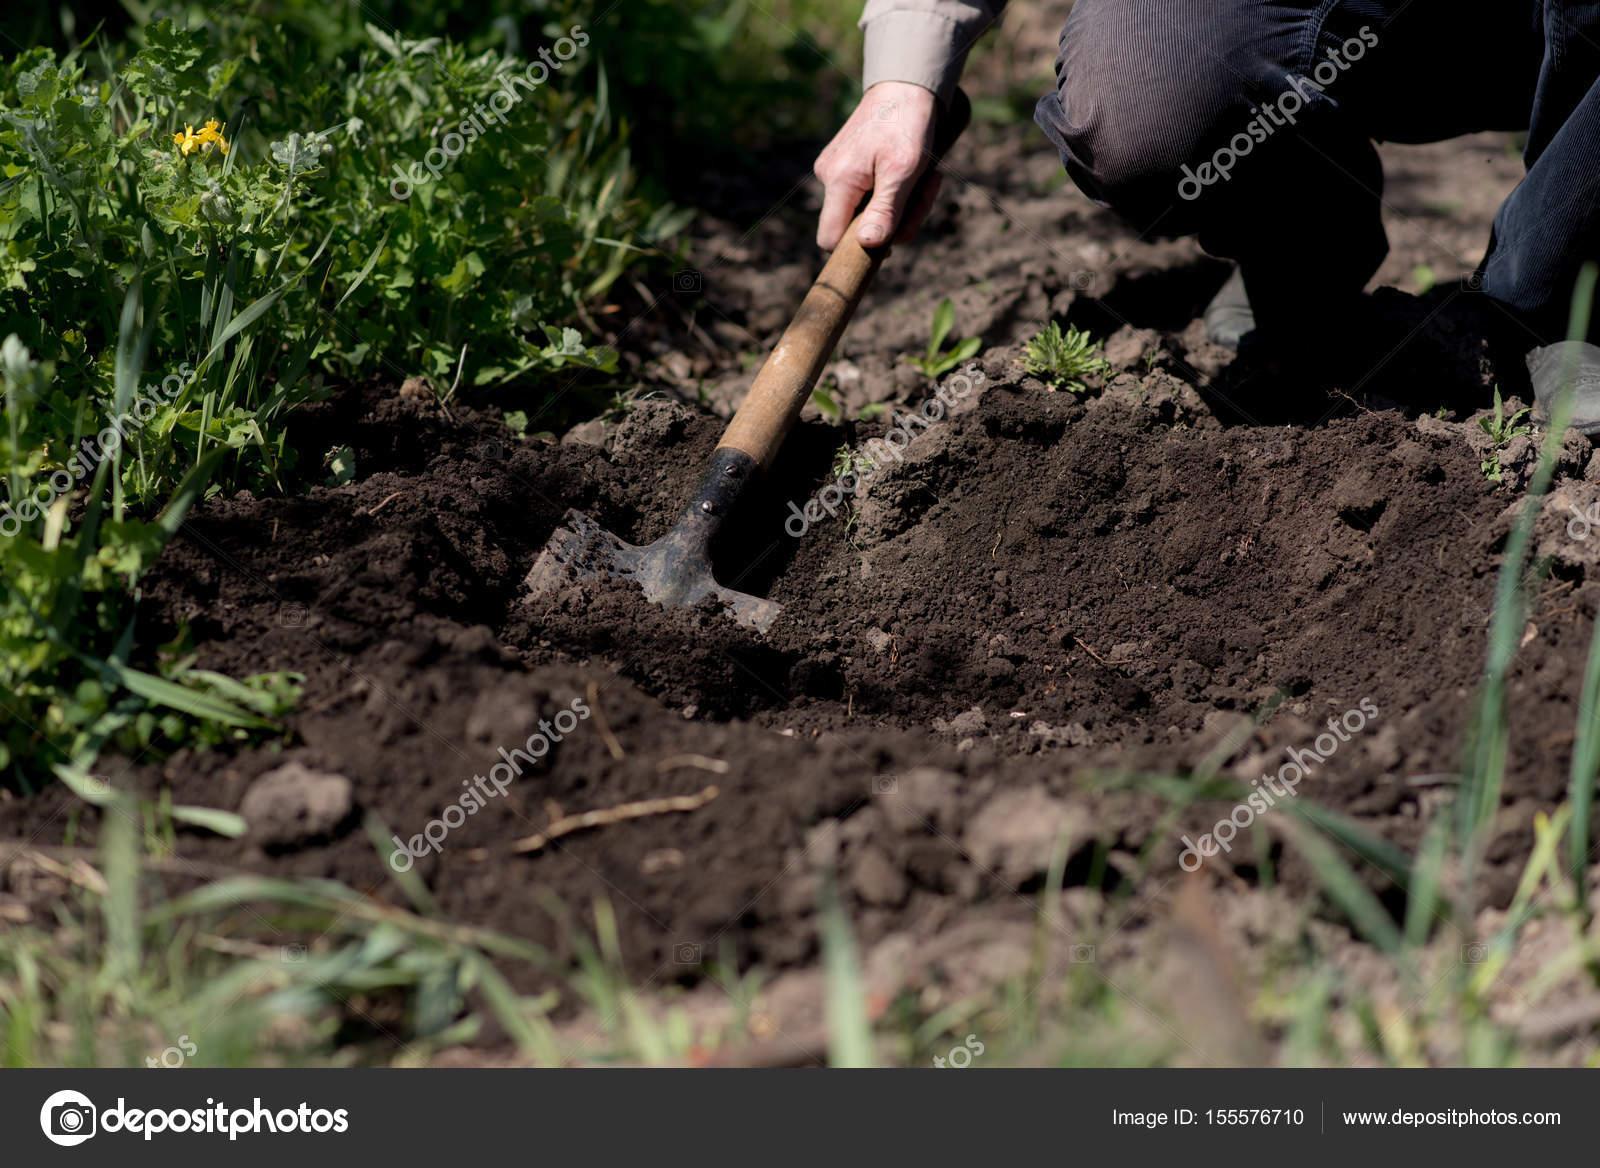 Uomo scava la terra con una pala — Foto Stock © ahfoto mail